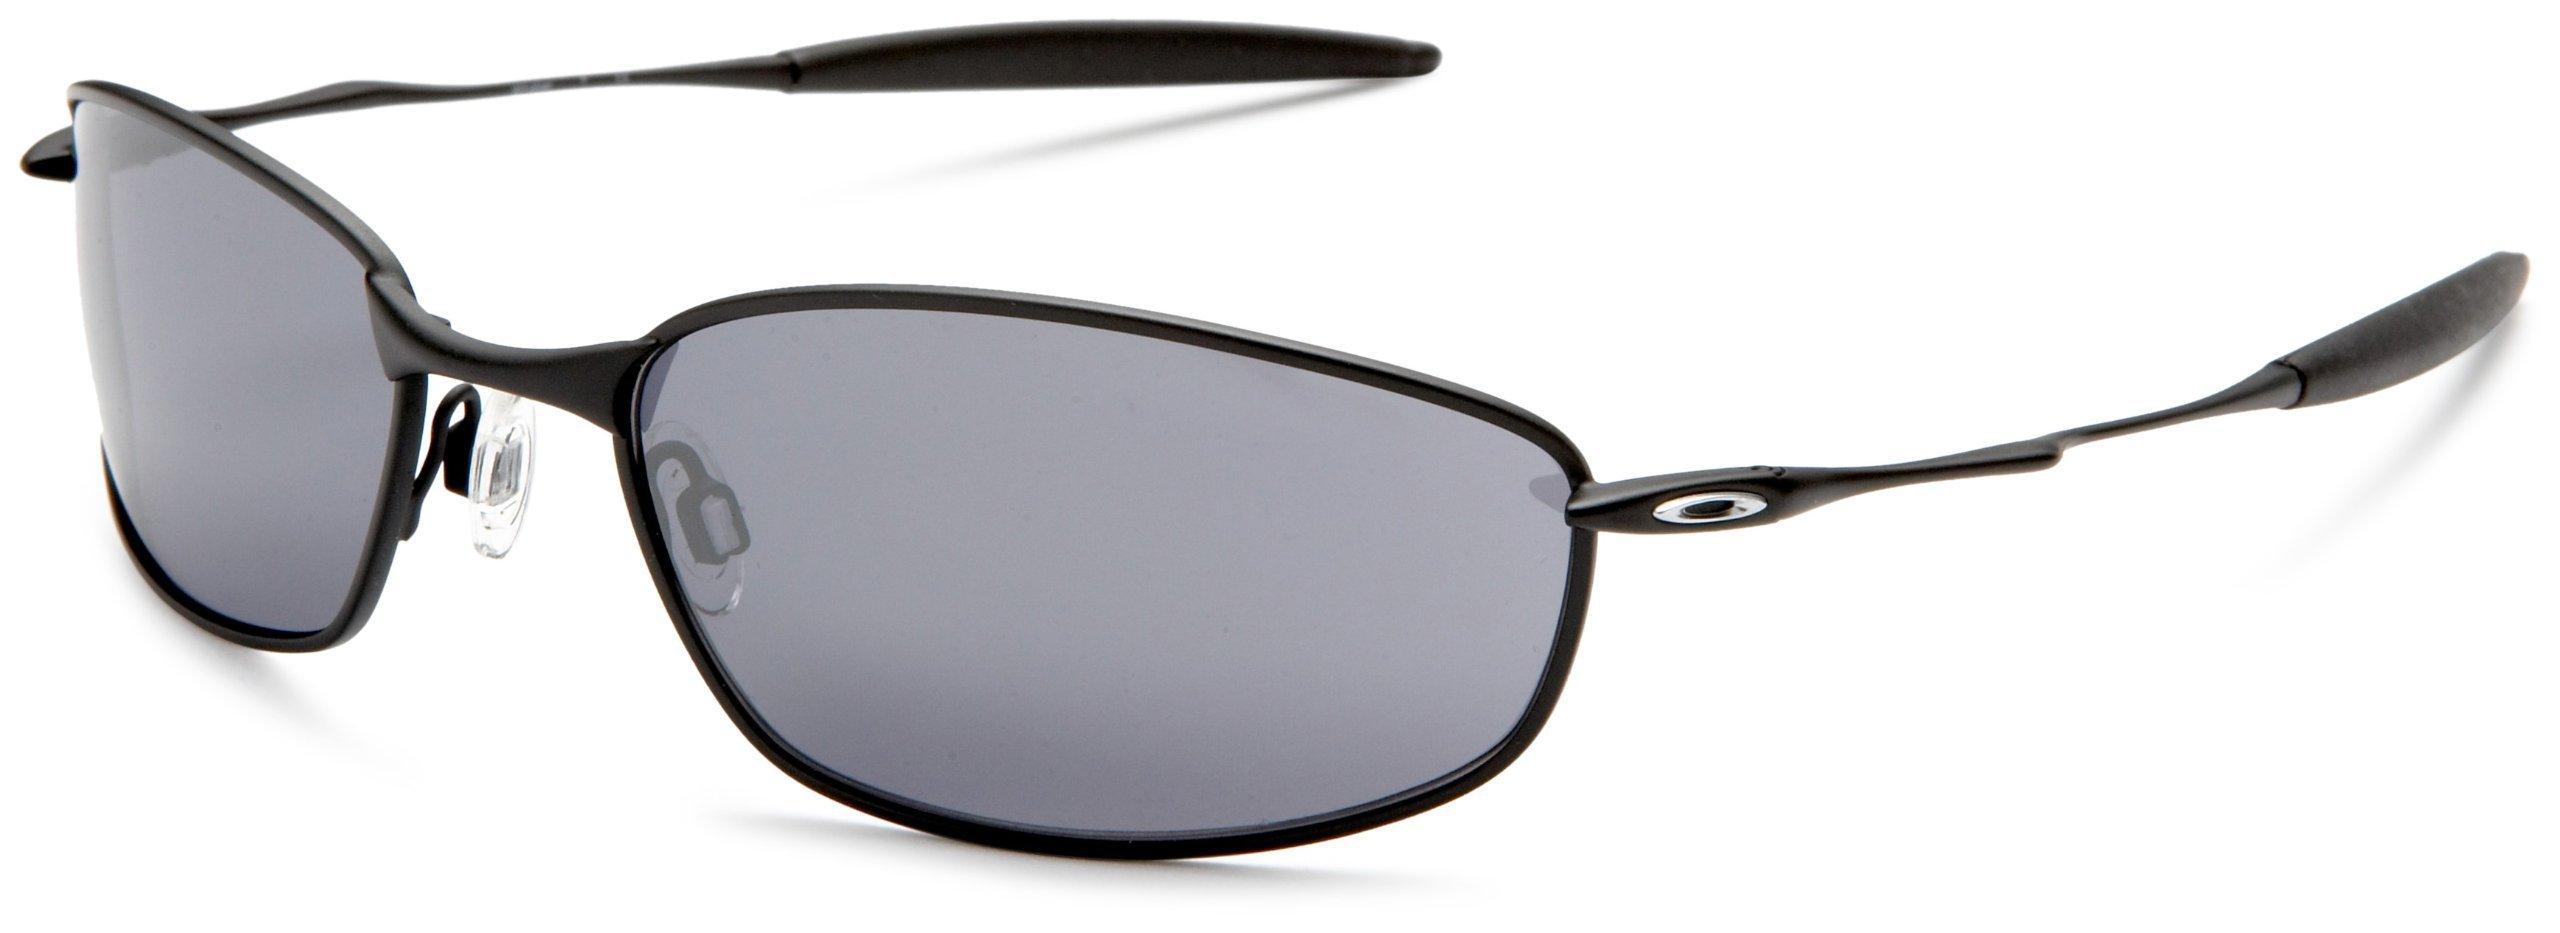 6172ac9437 Oakley Whisker Black Frame « Heritage Malta